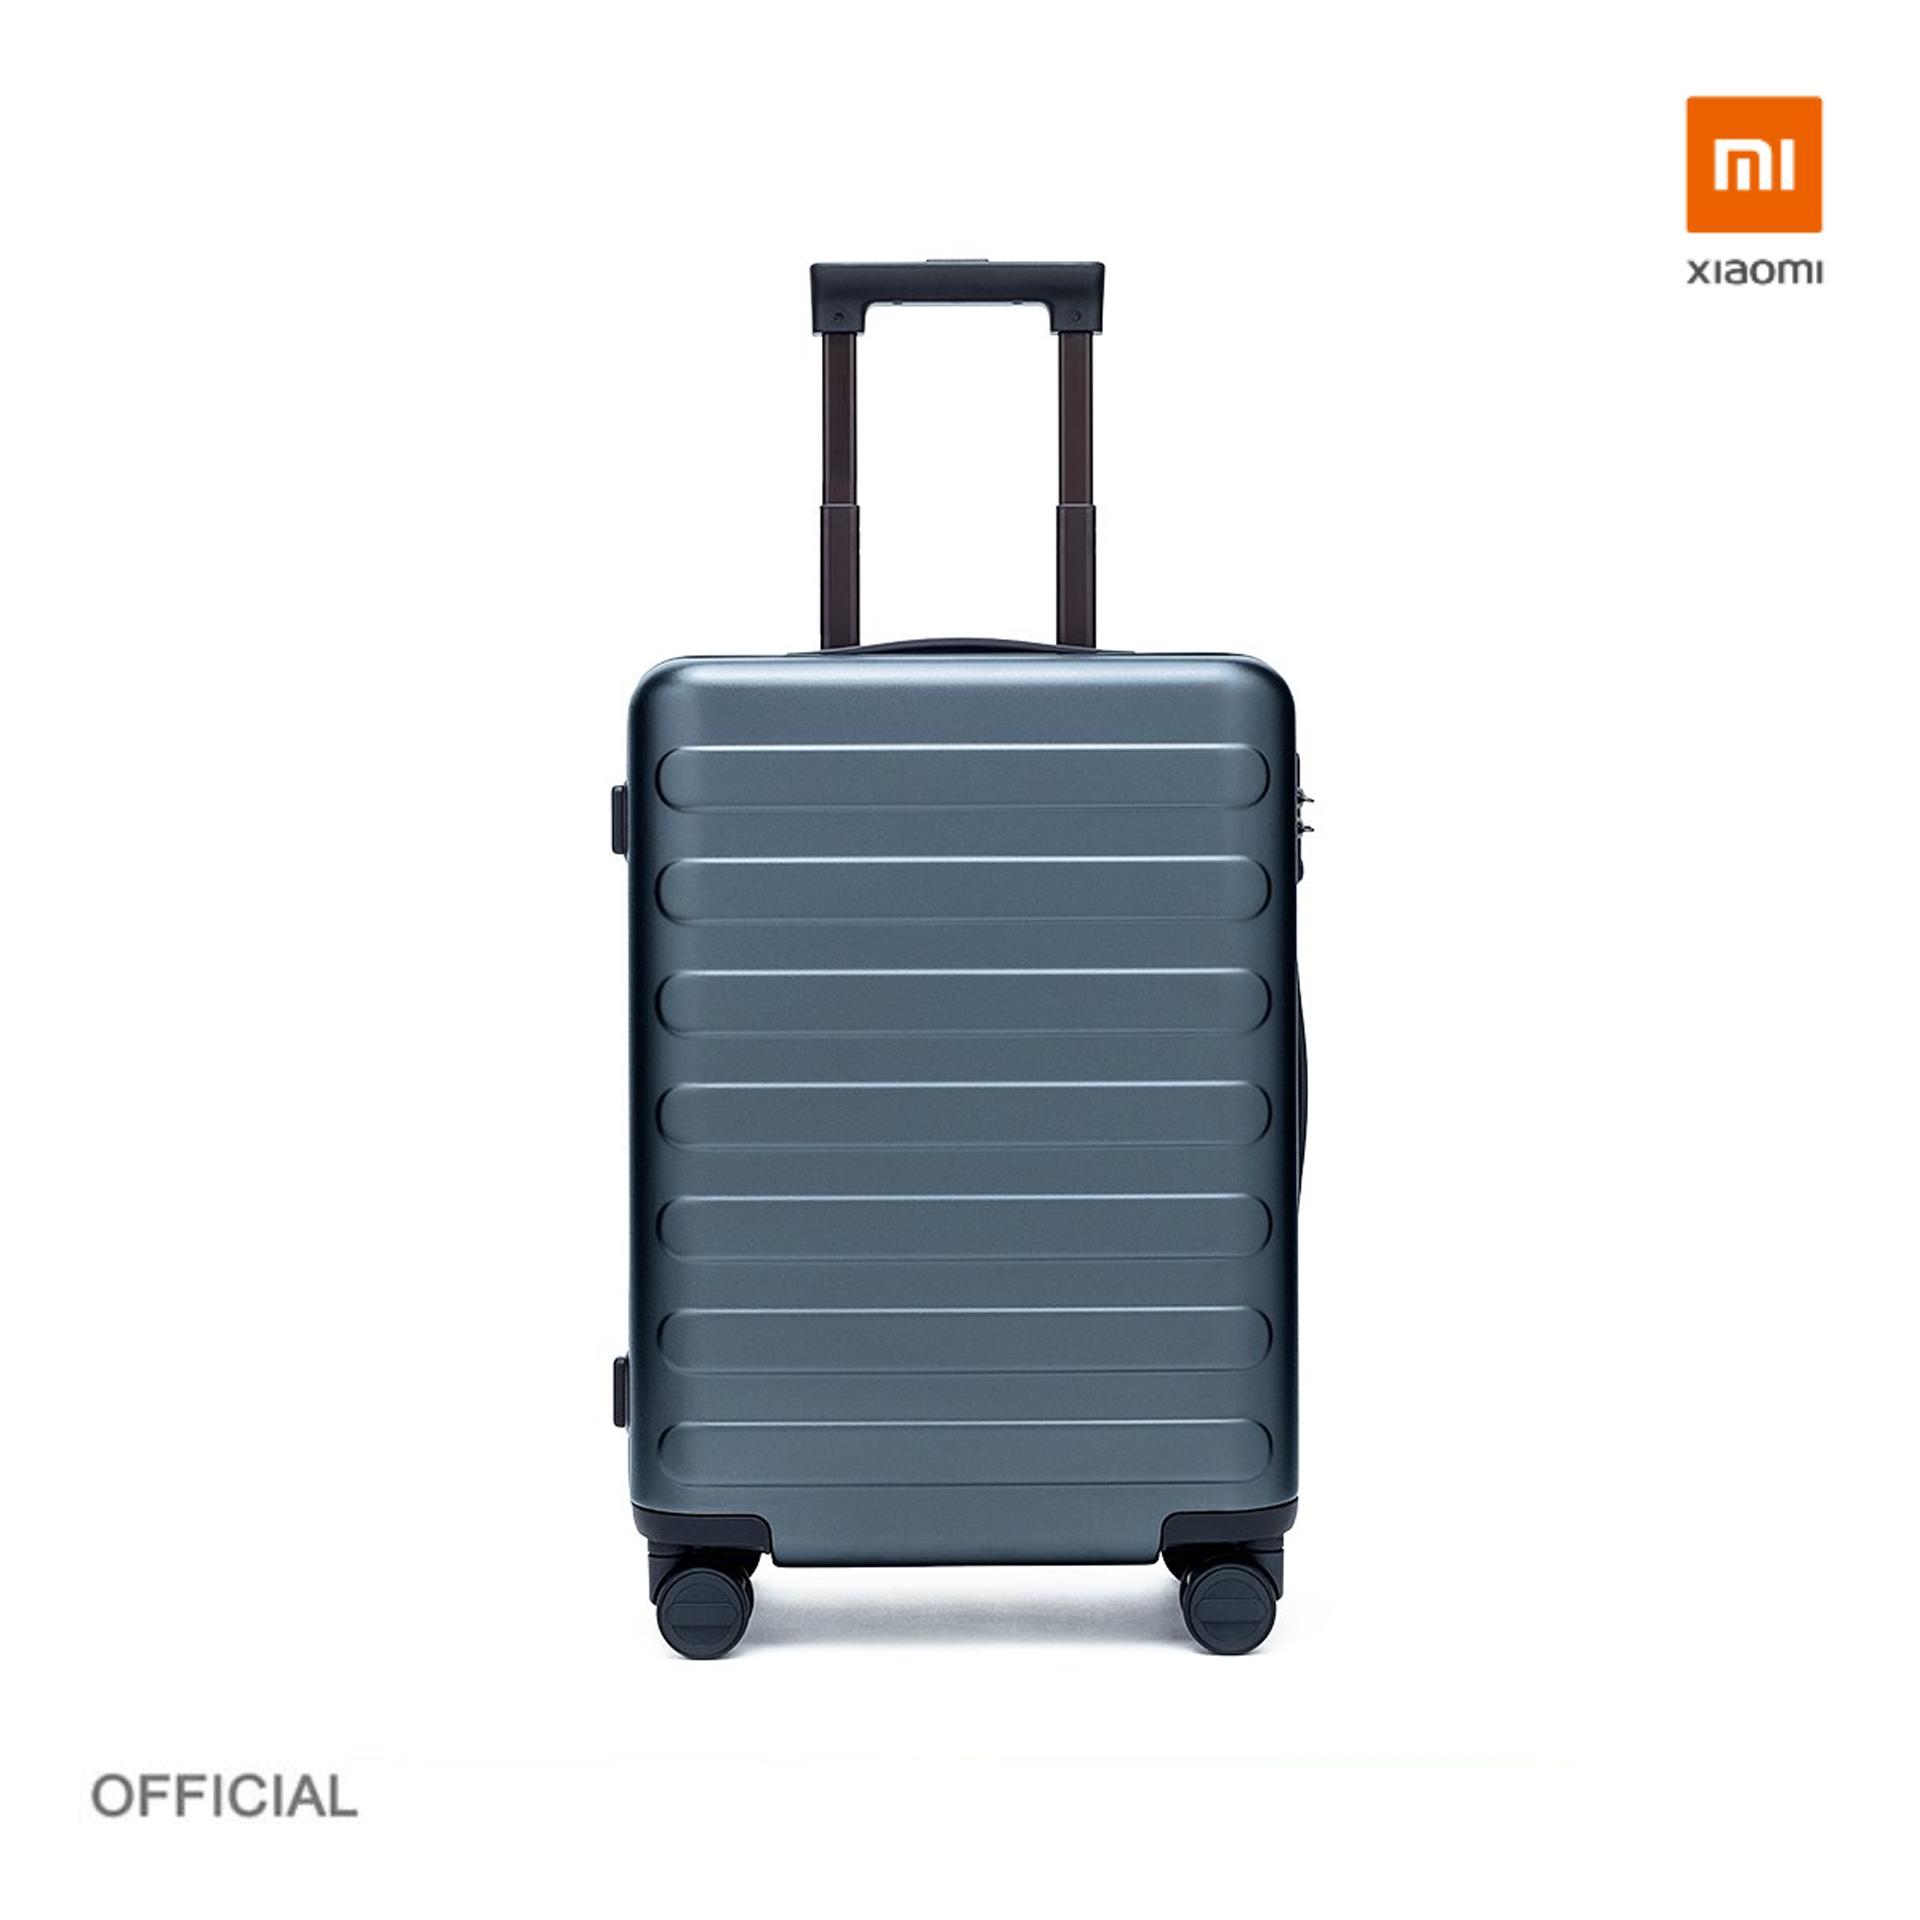 Xiaomi NINETYGO Business Travel Luggage 24